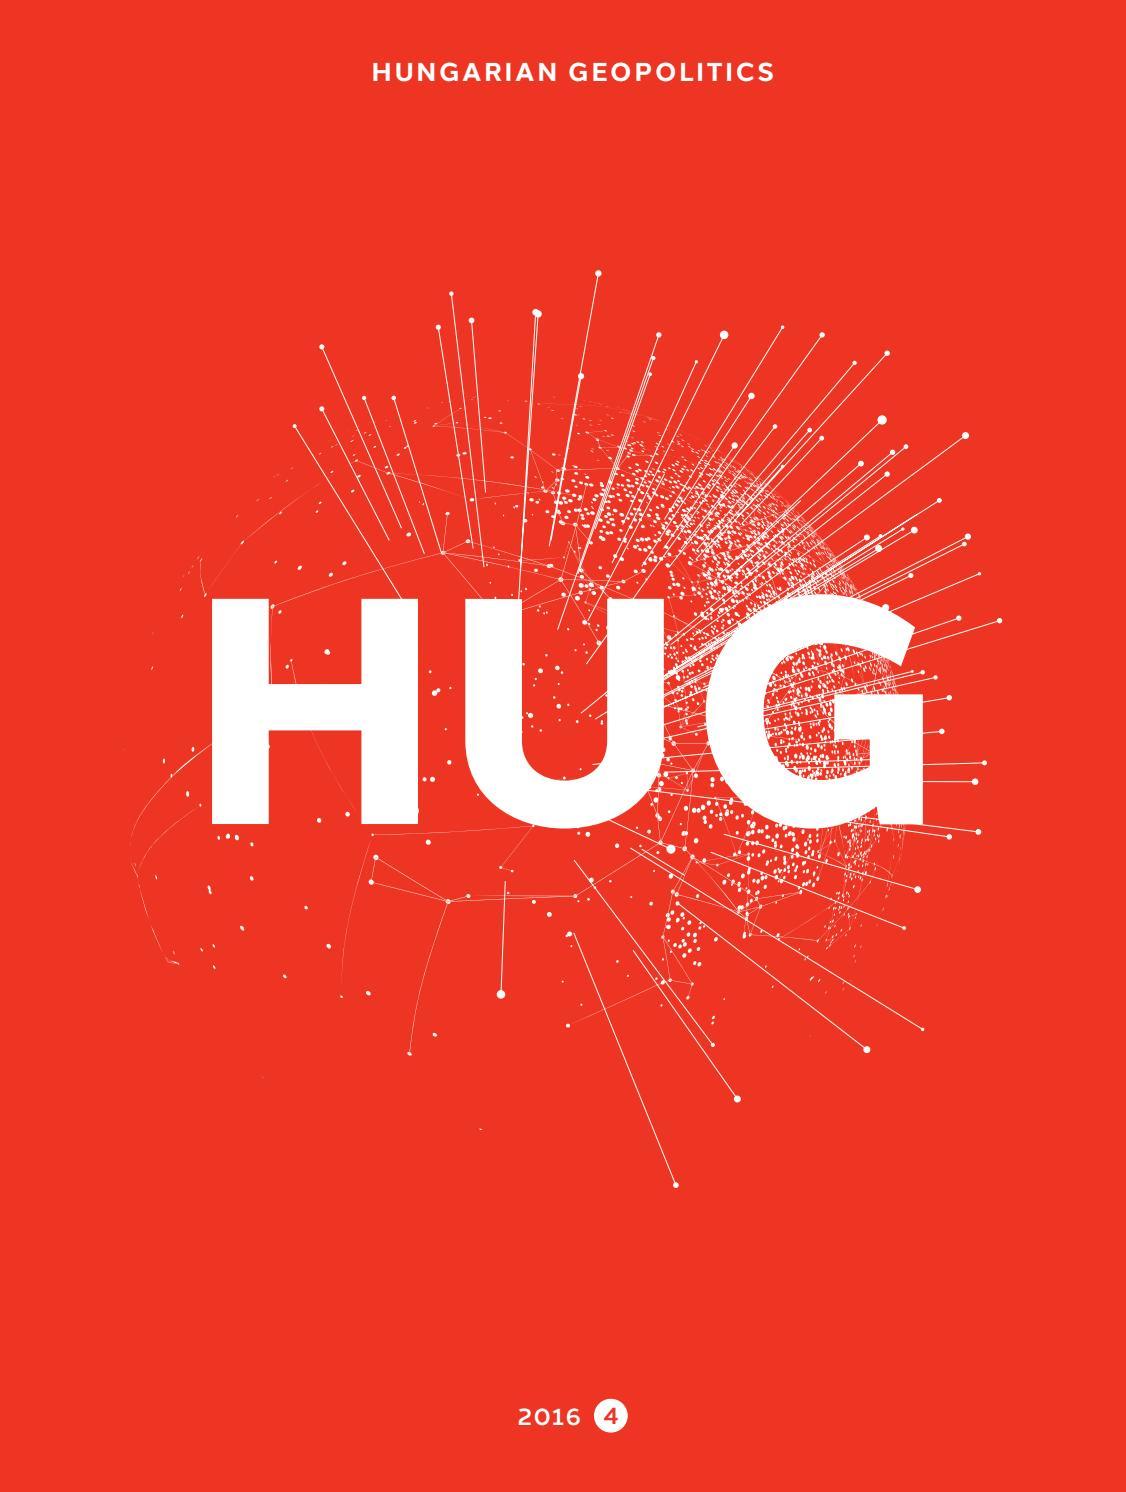 HUG Magazin - 4. szám by PAIGEO - Pallas Athene Innovation and Geopolitical Foundation - Issuu